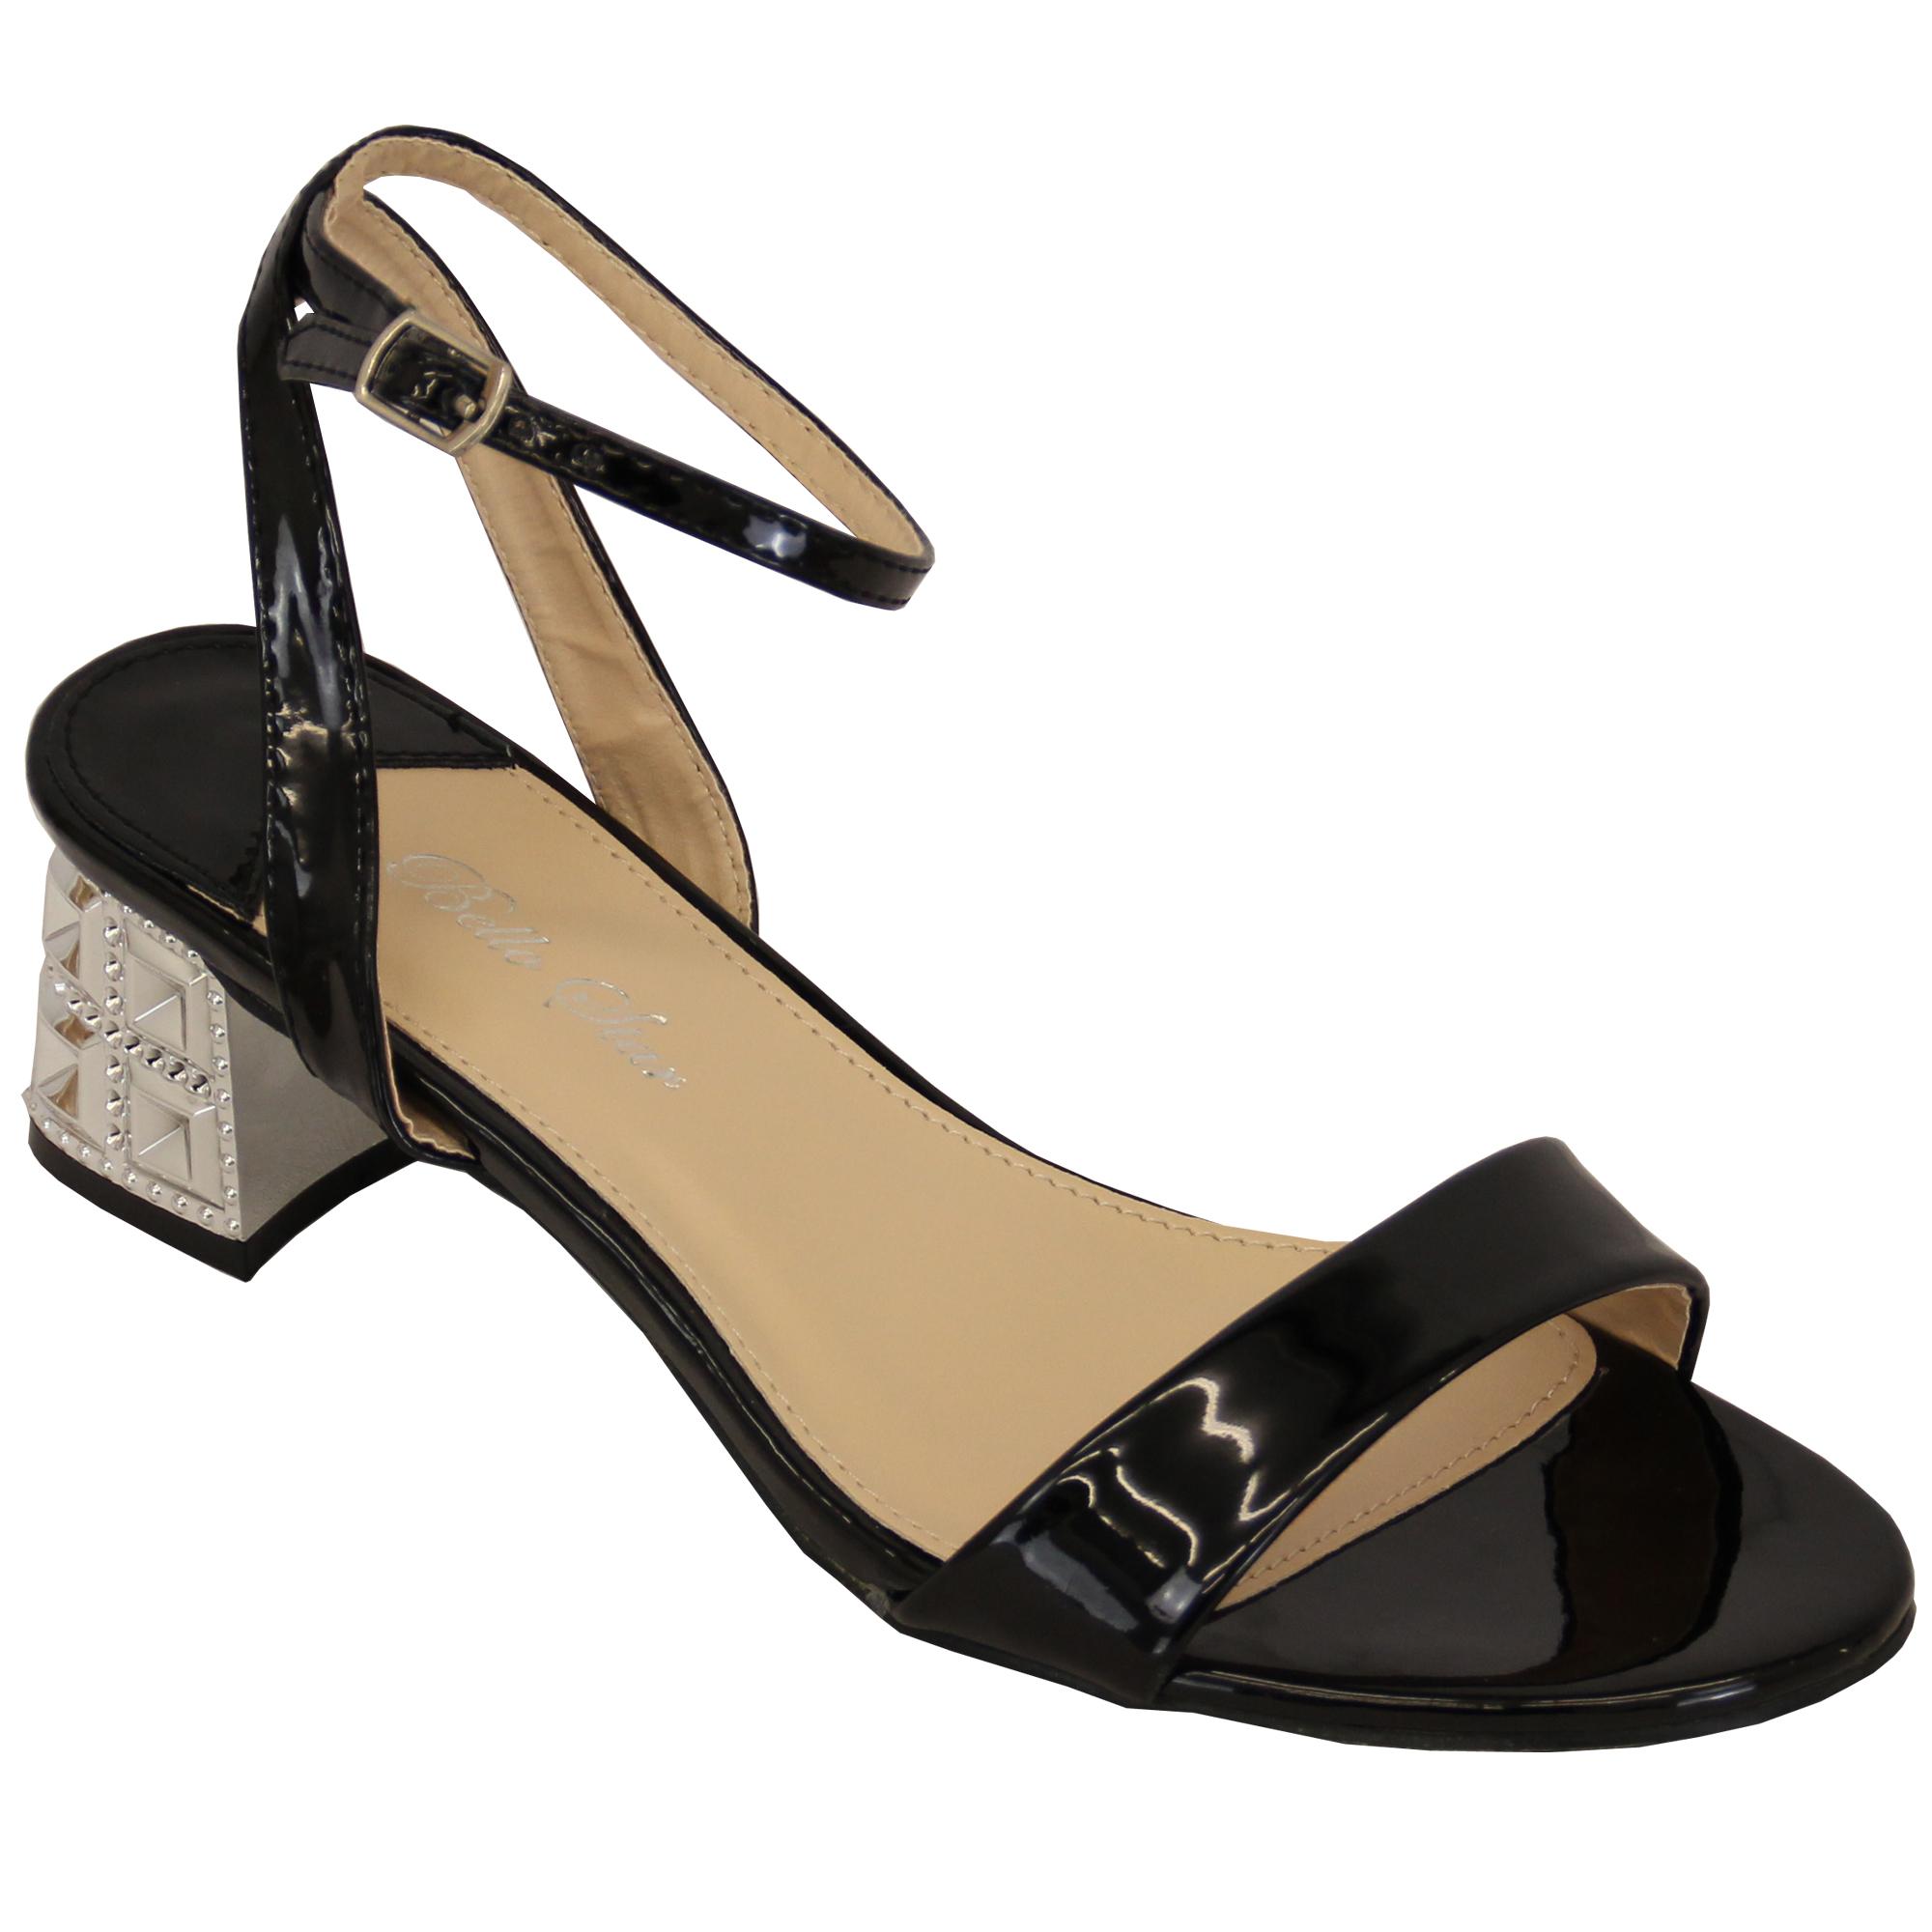 damen blockabsatz sandalen damen riemchen open toe. Black Bedroom Furniture Sets. Home Design Ideas